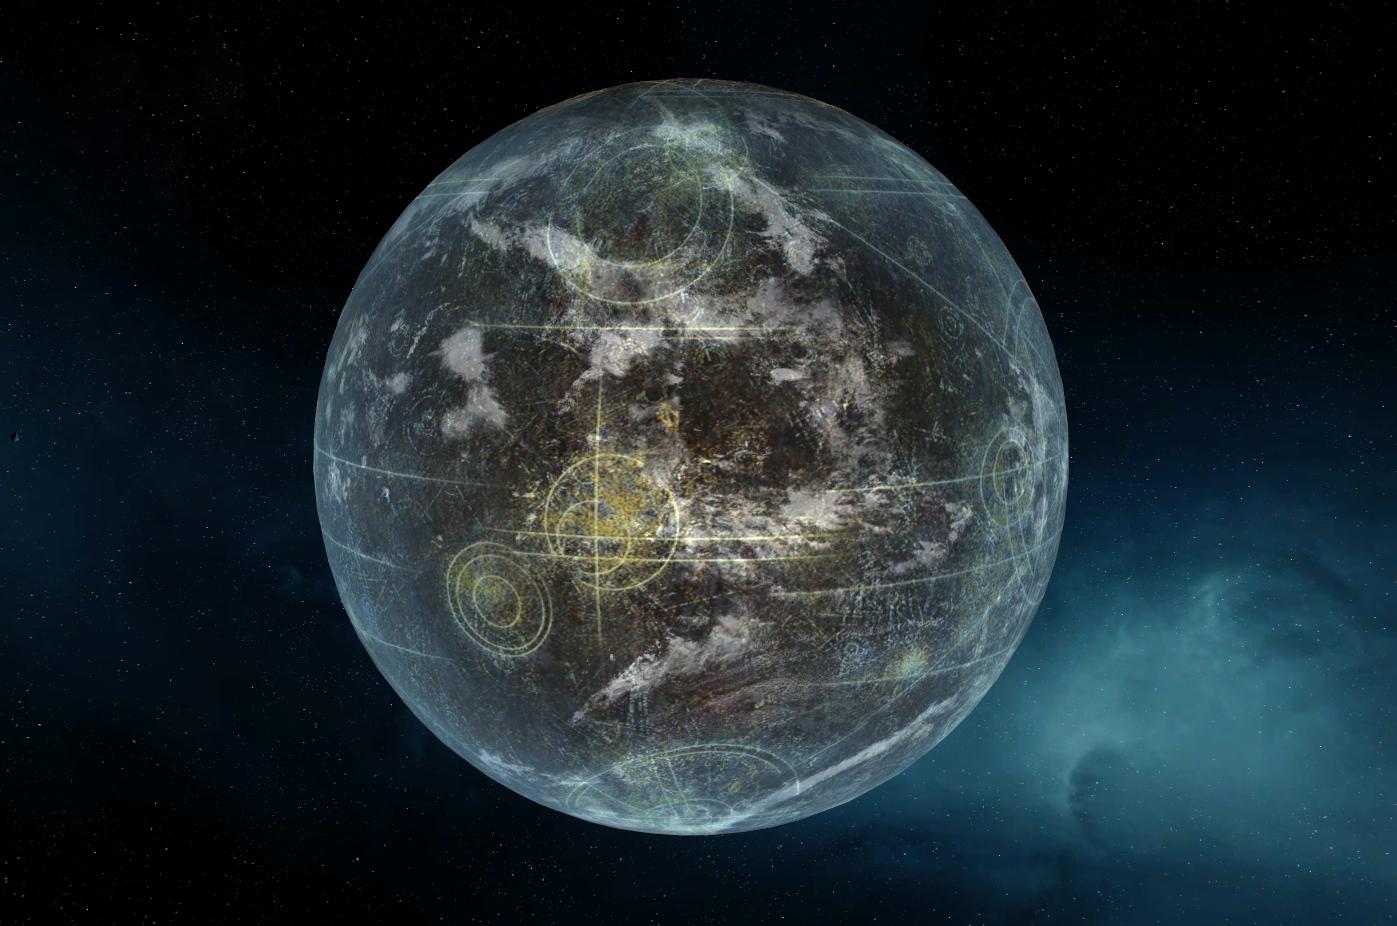 new ecumenopolis - xpgamers lets play image